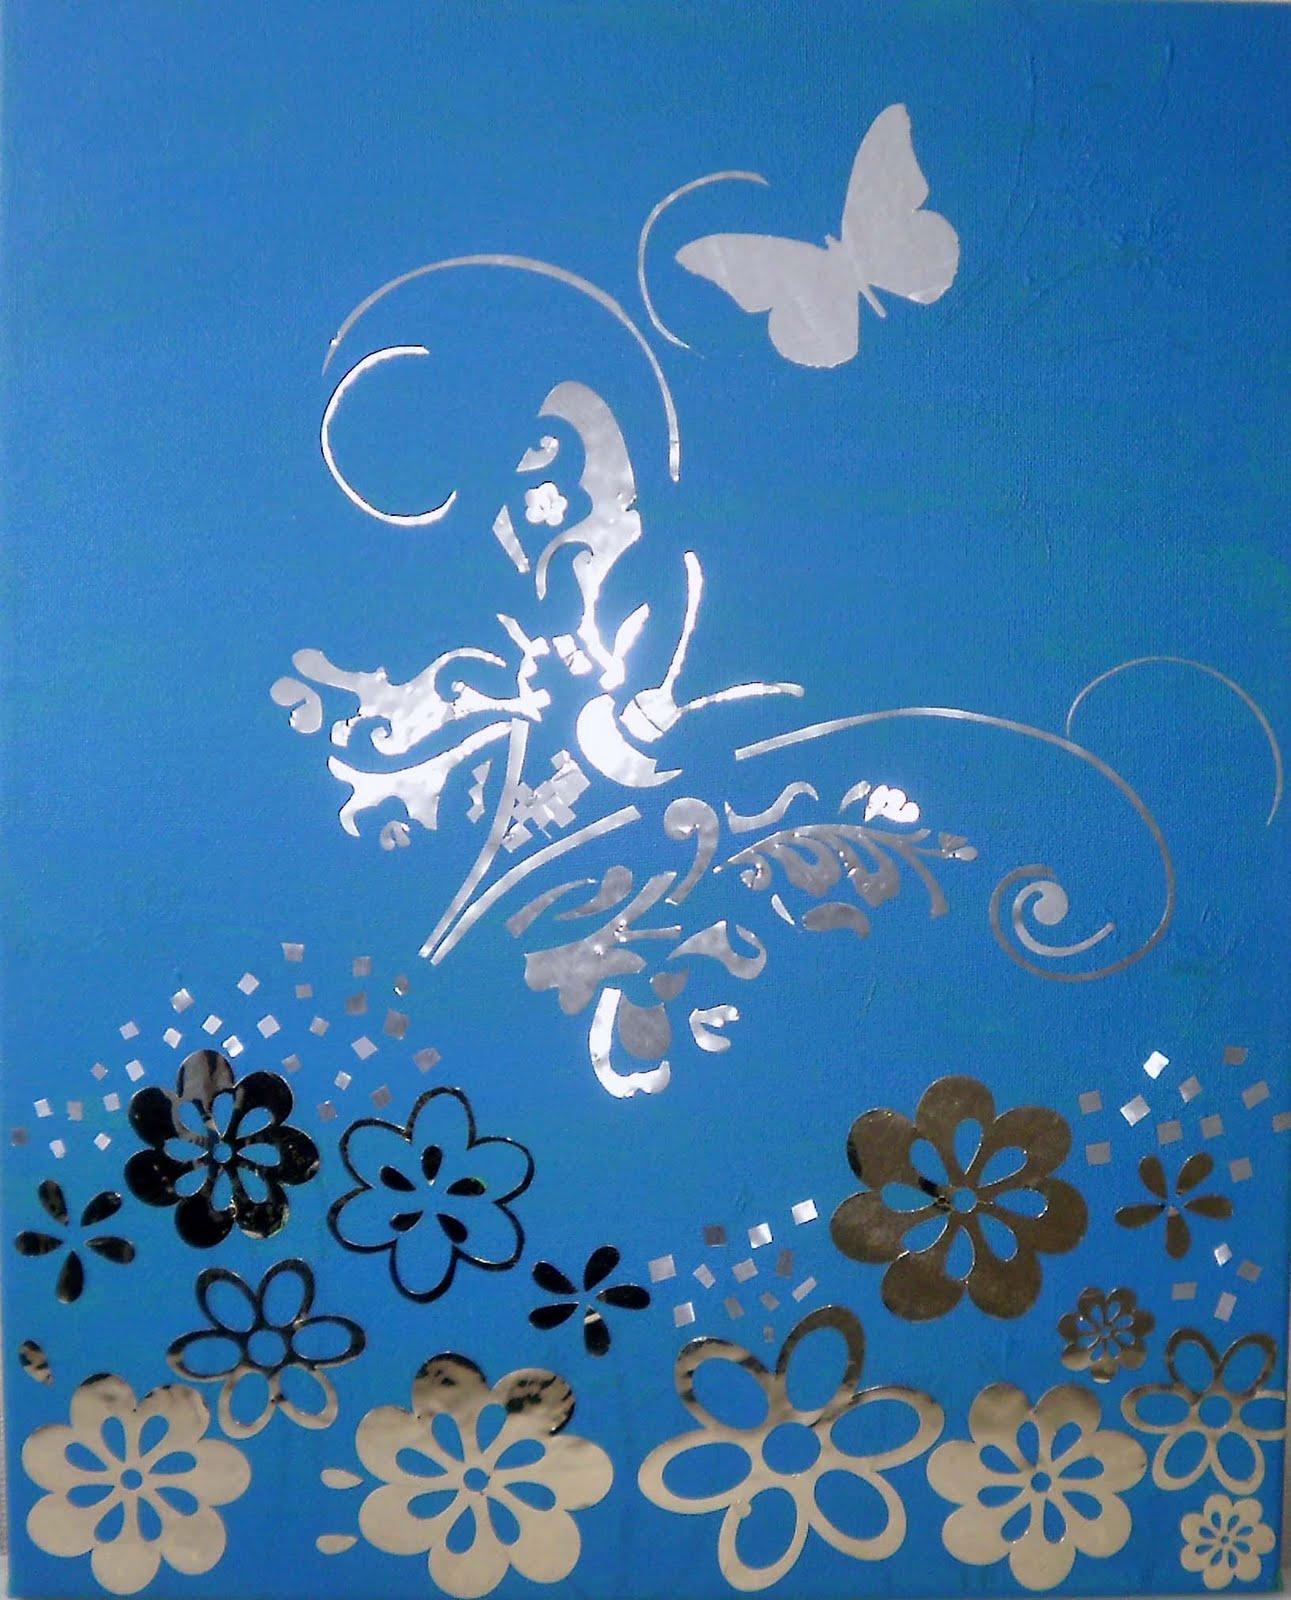 Cuadros Modernos Fantasias: Cuadro Fantasía Mariposas